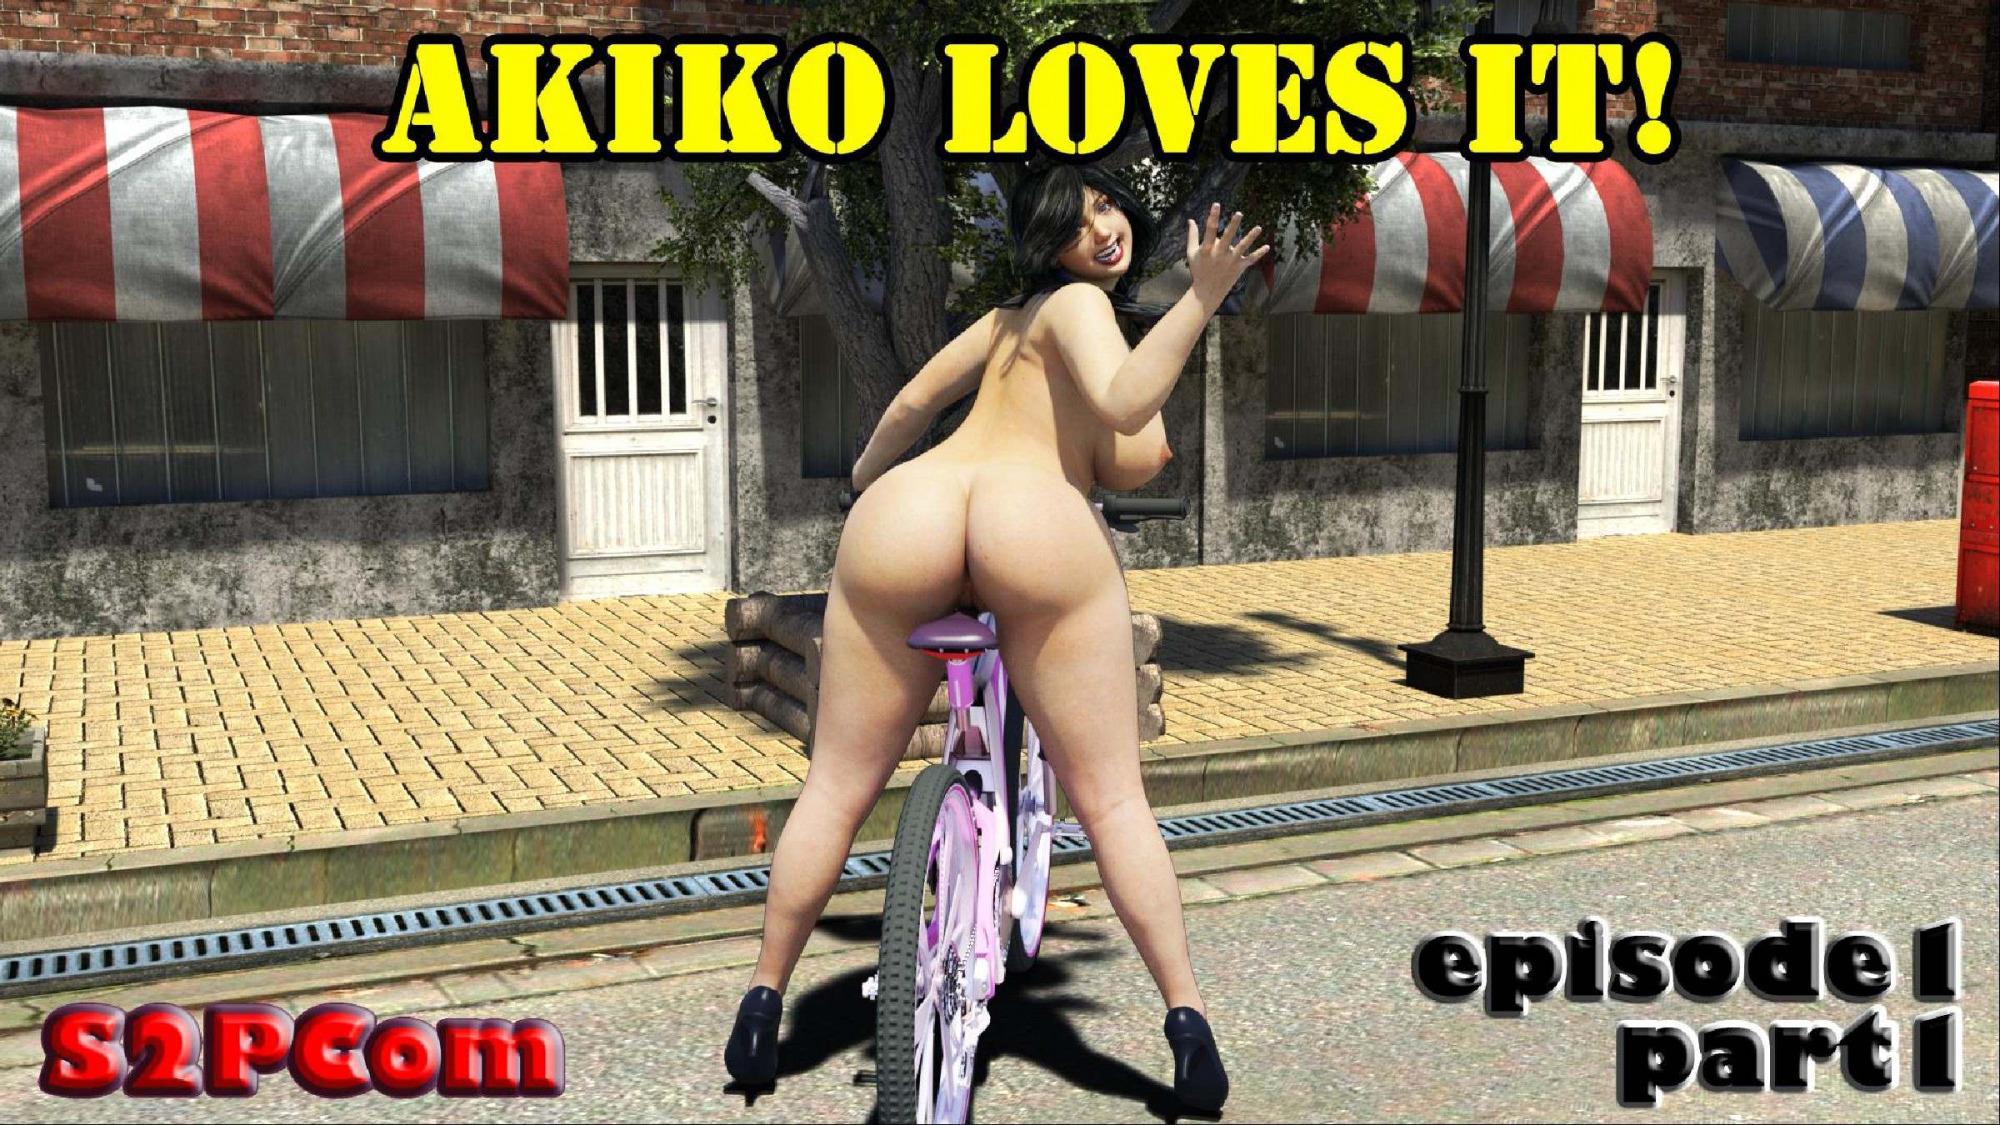 S2PCom- Akiko Loves It Episode.1 porn comics 8 muses